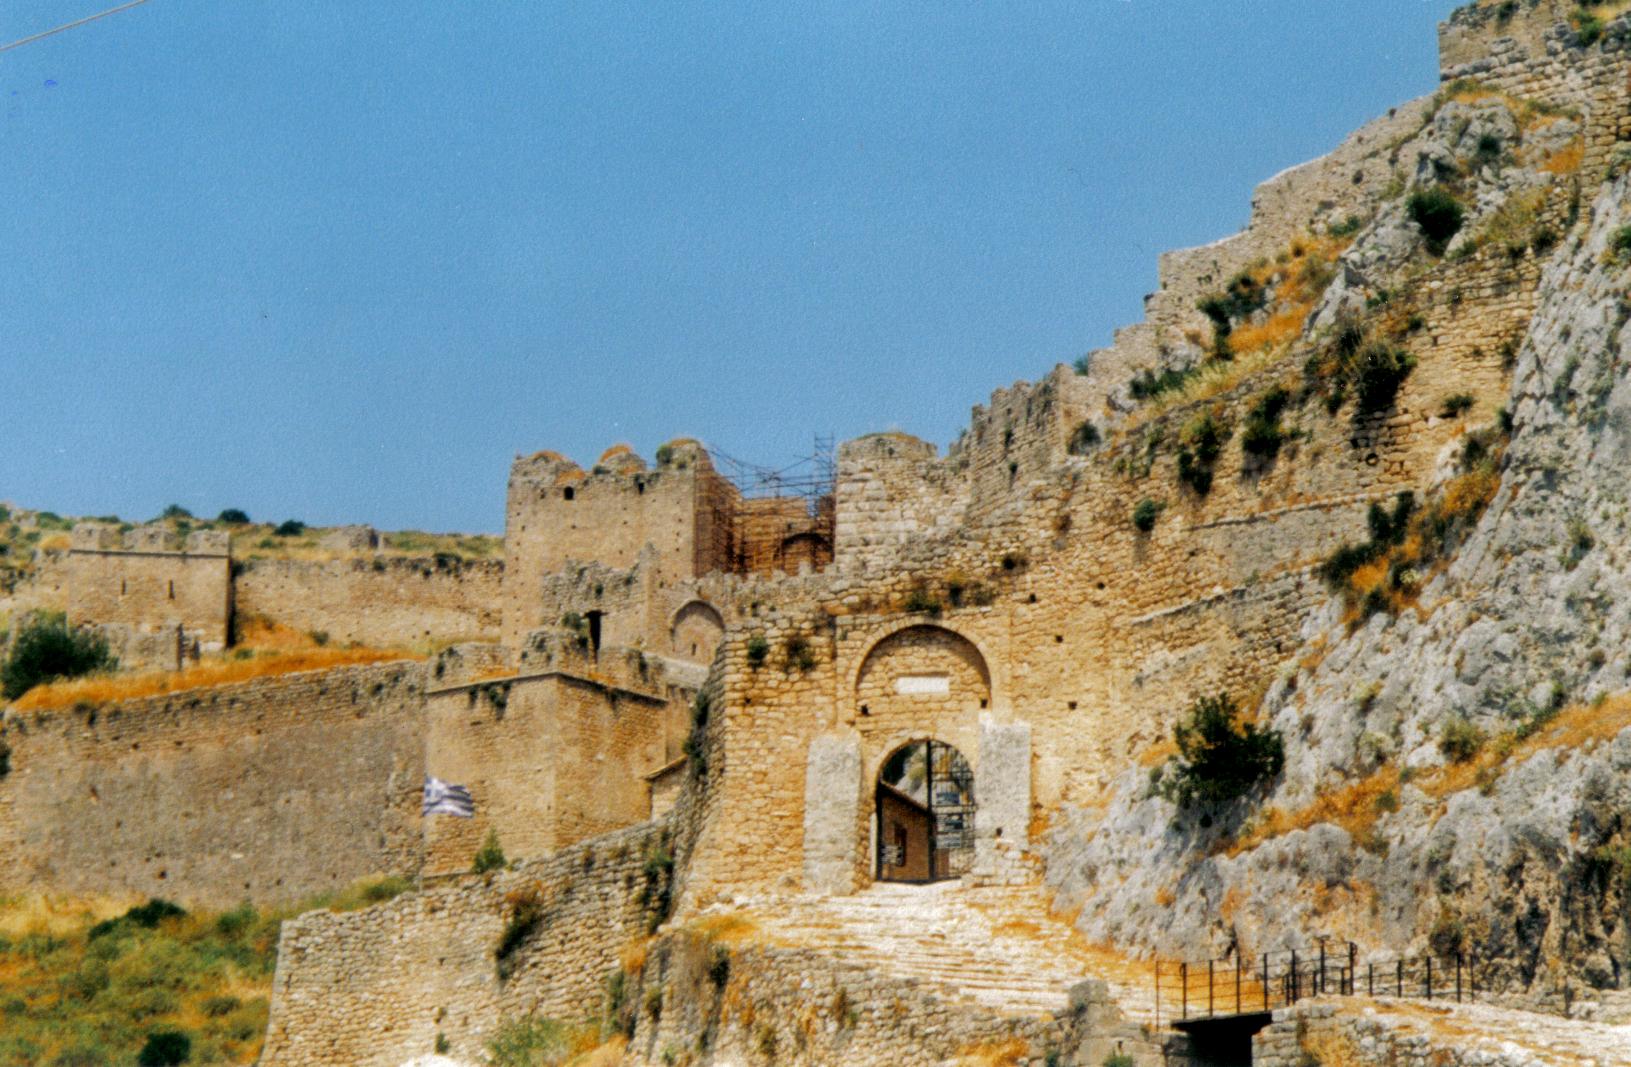 File:Acrocorinth Gateway.jpg - Wikimedia Commons